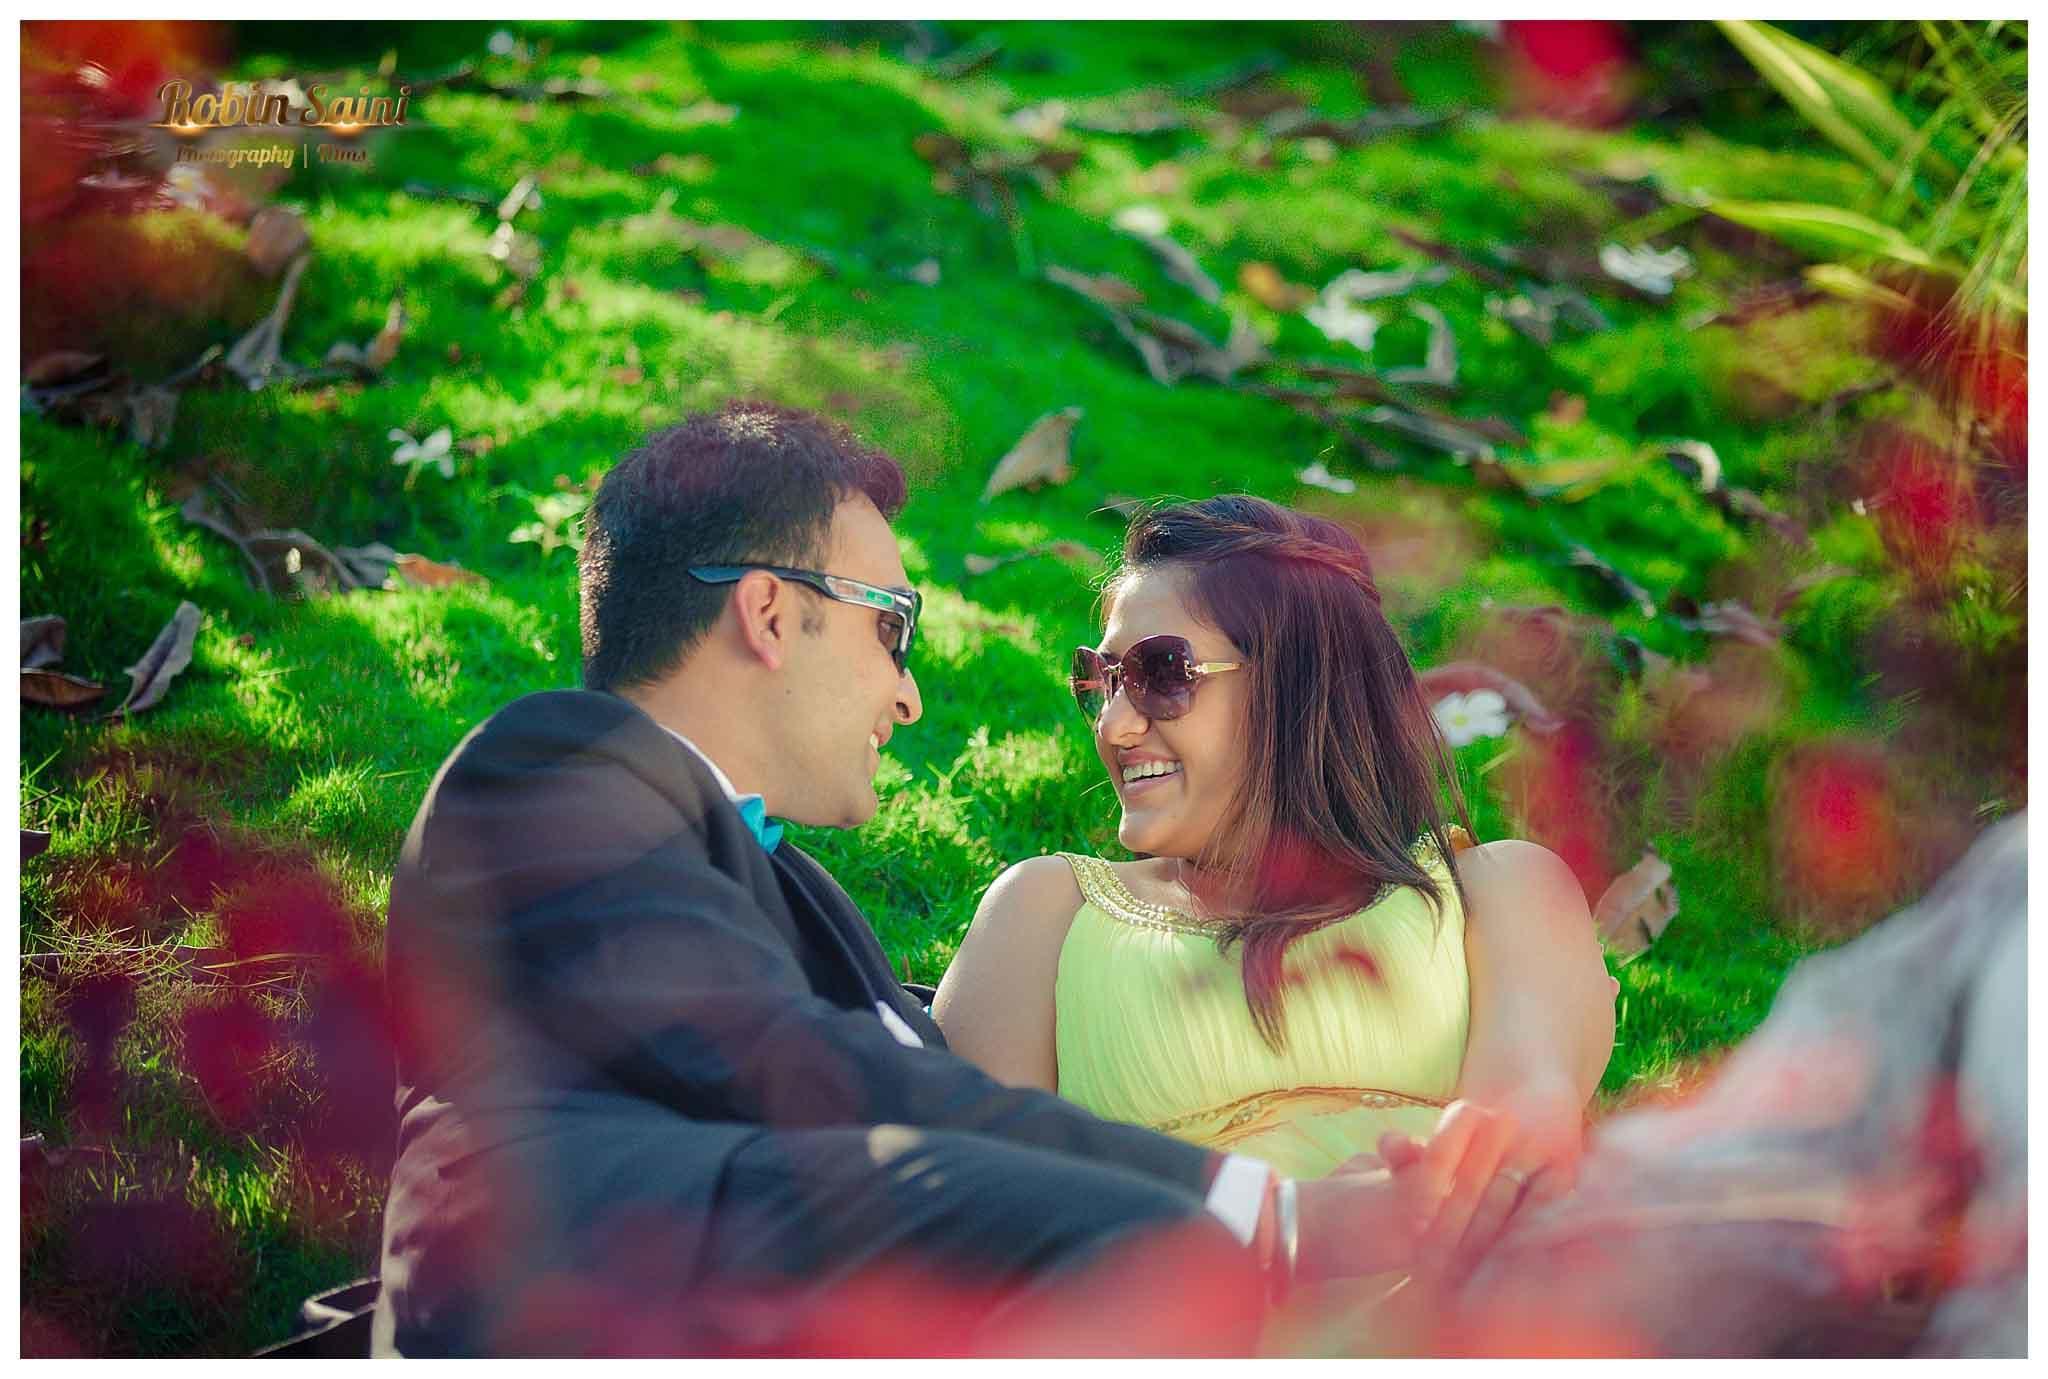 pre wedding photography:robin saini photography